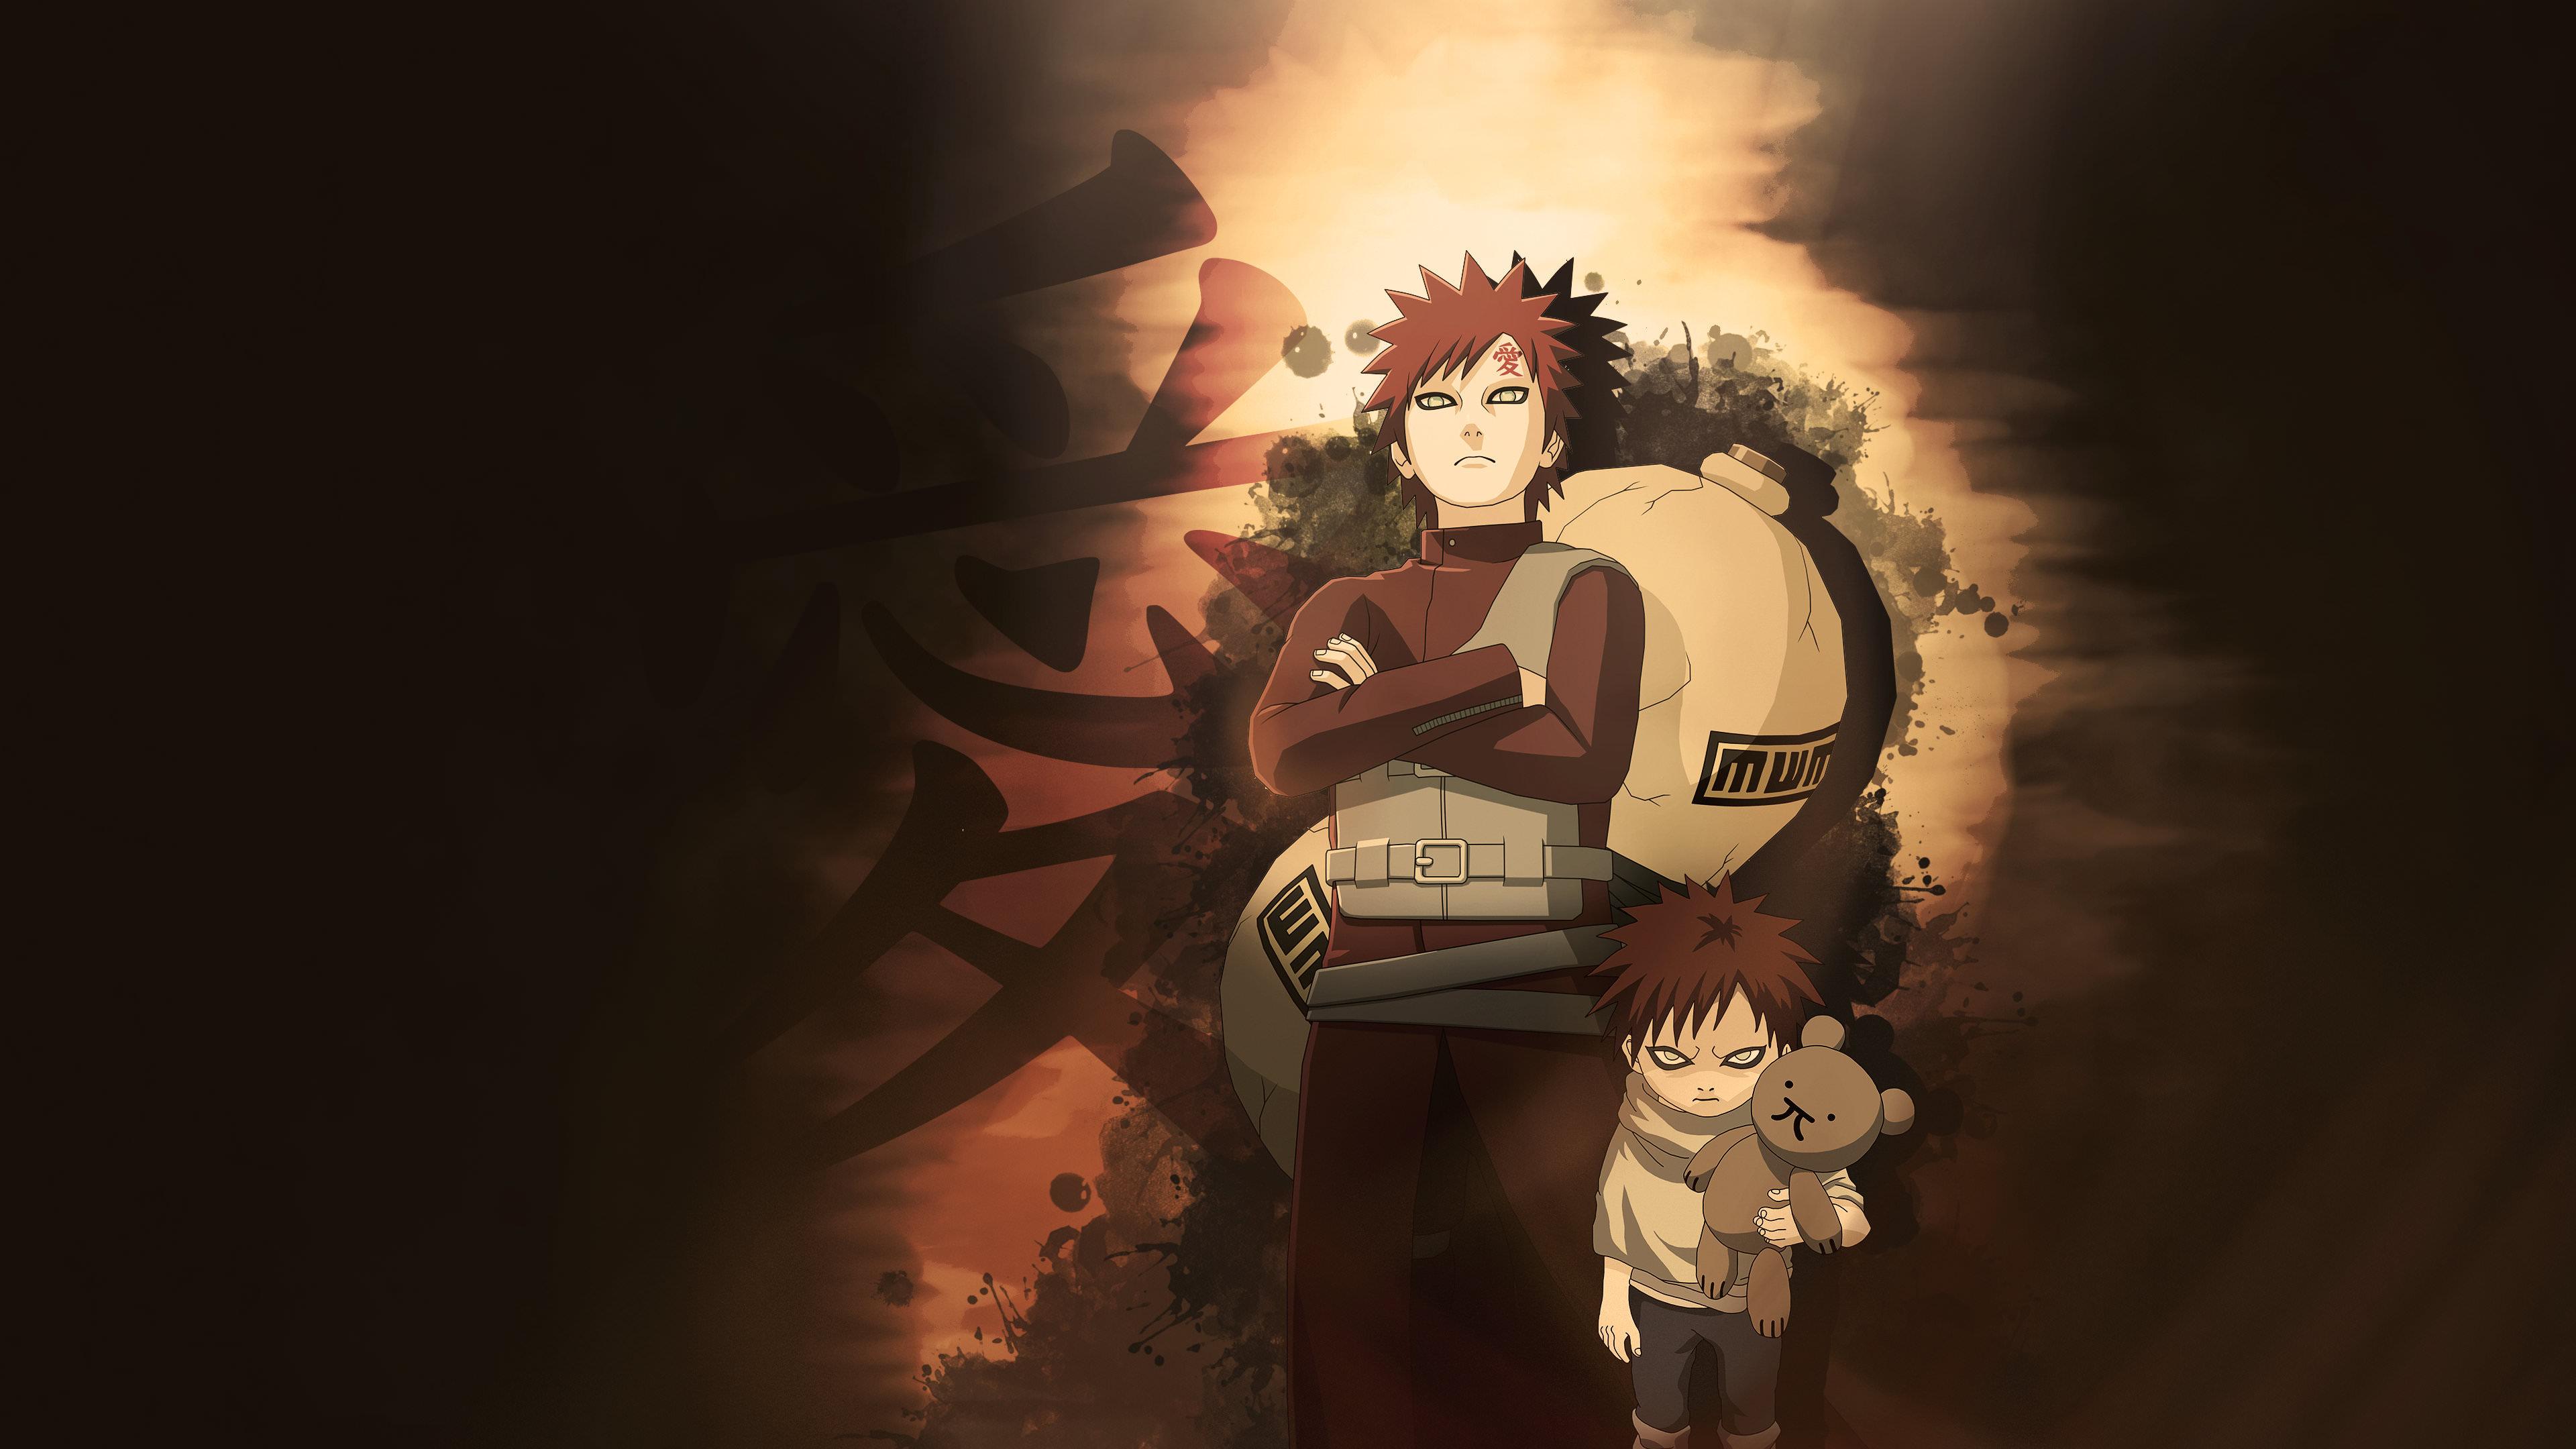 77 Naruto Shippuden Wallpaper For Desktop On Wallpapersafari